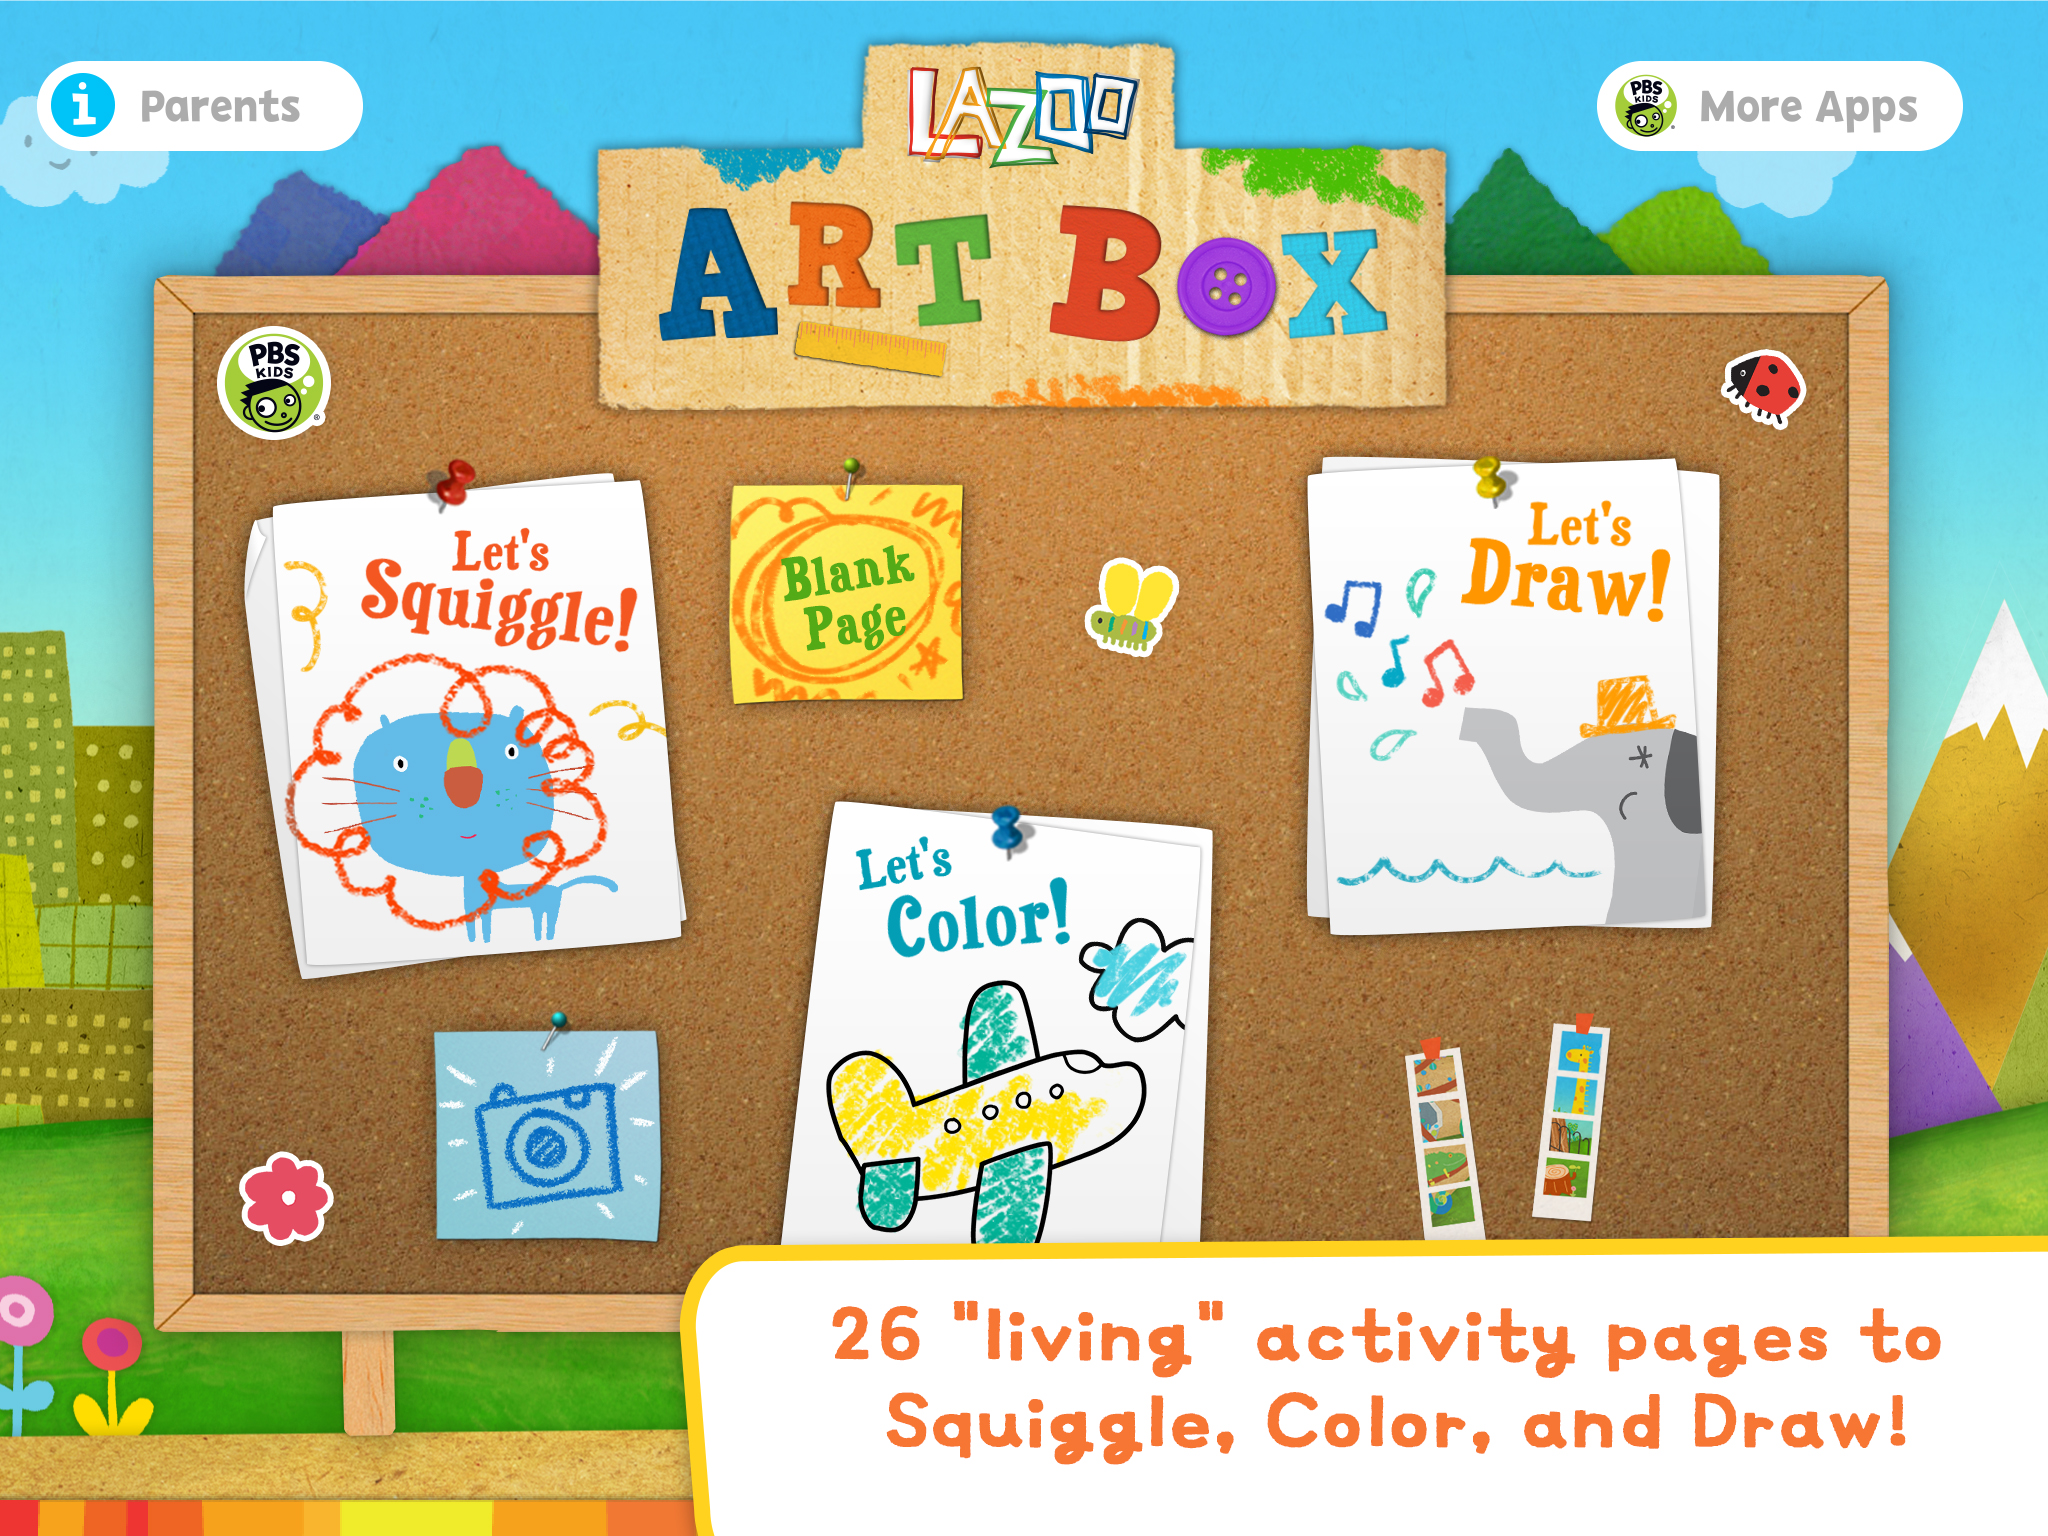 Lazoo Art Box Screenshot